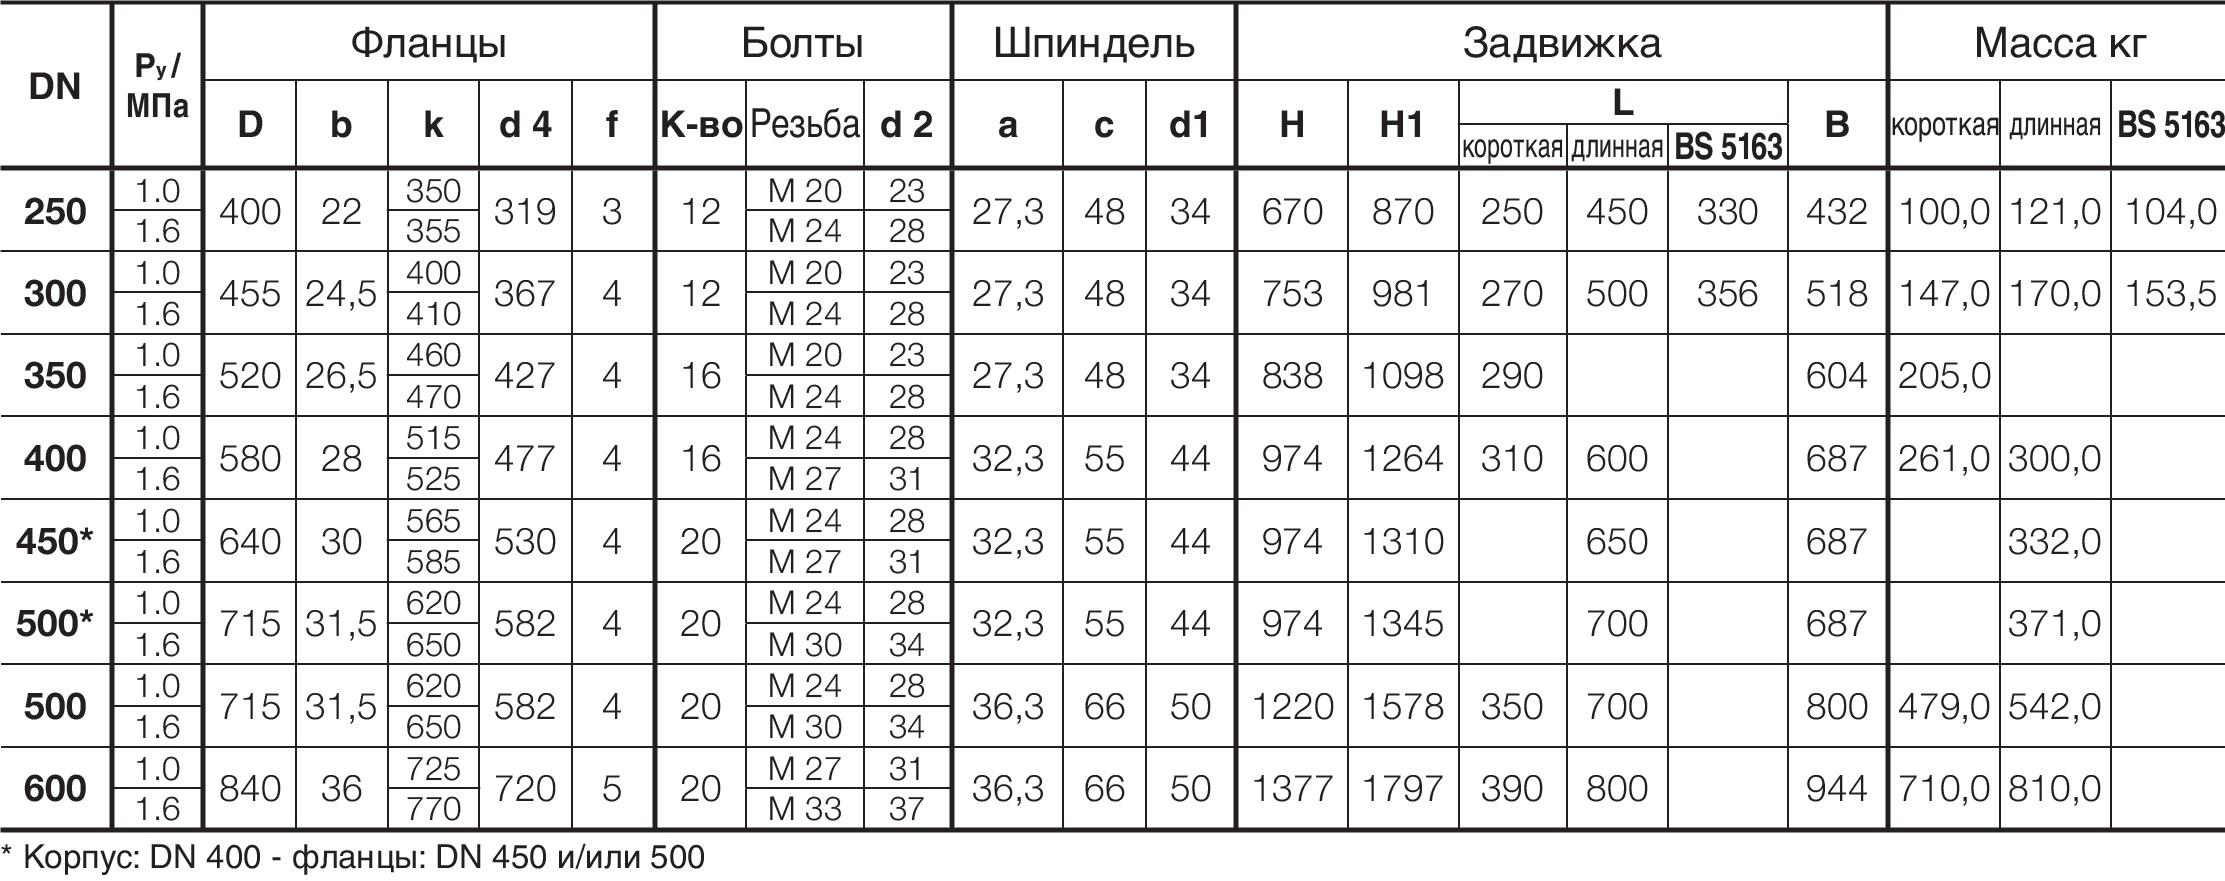 Таблица характеристик для Задвижка клиновая чугунная фланцевая Hawle 4000ELE2 (под электропривод) DN125 PN16